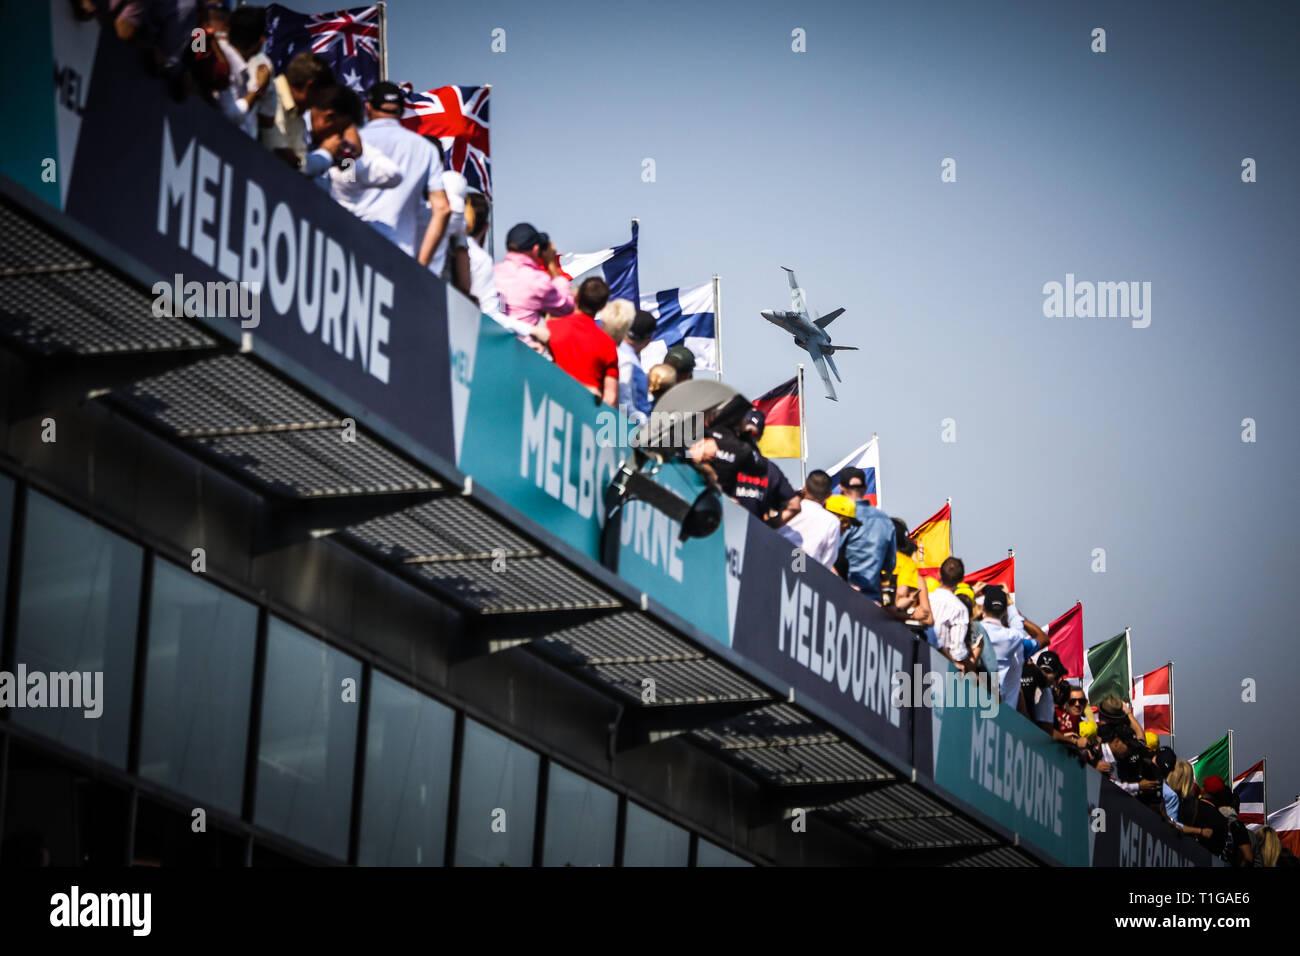 MELBOURNE, AUSTRALIA - MARCH 17: RAAF F/A-18 Jet display on day 4 of the 2019 Formula 1 Australian Grand Prix - Stock Image